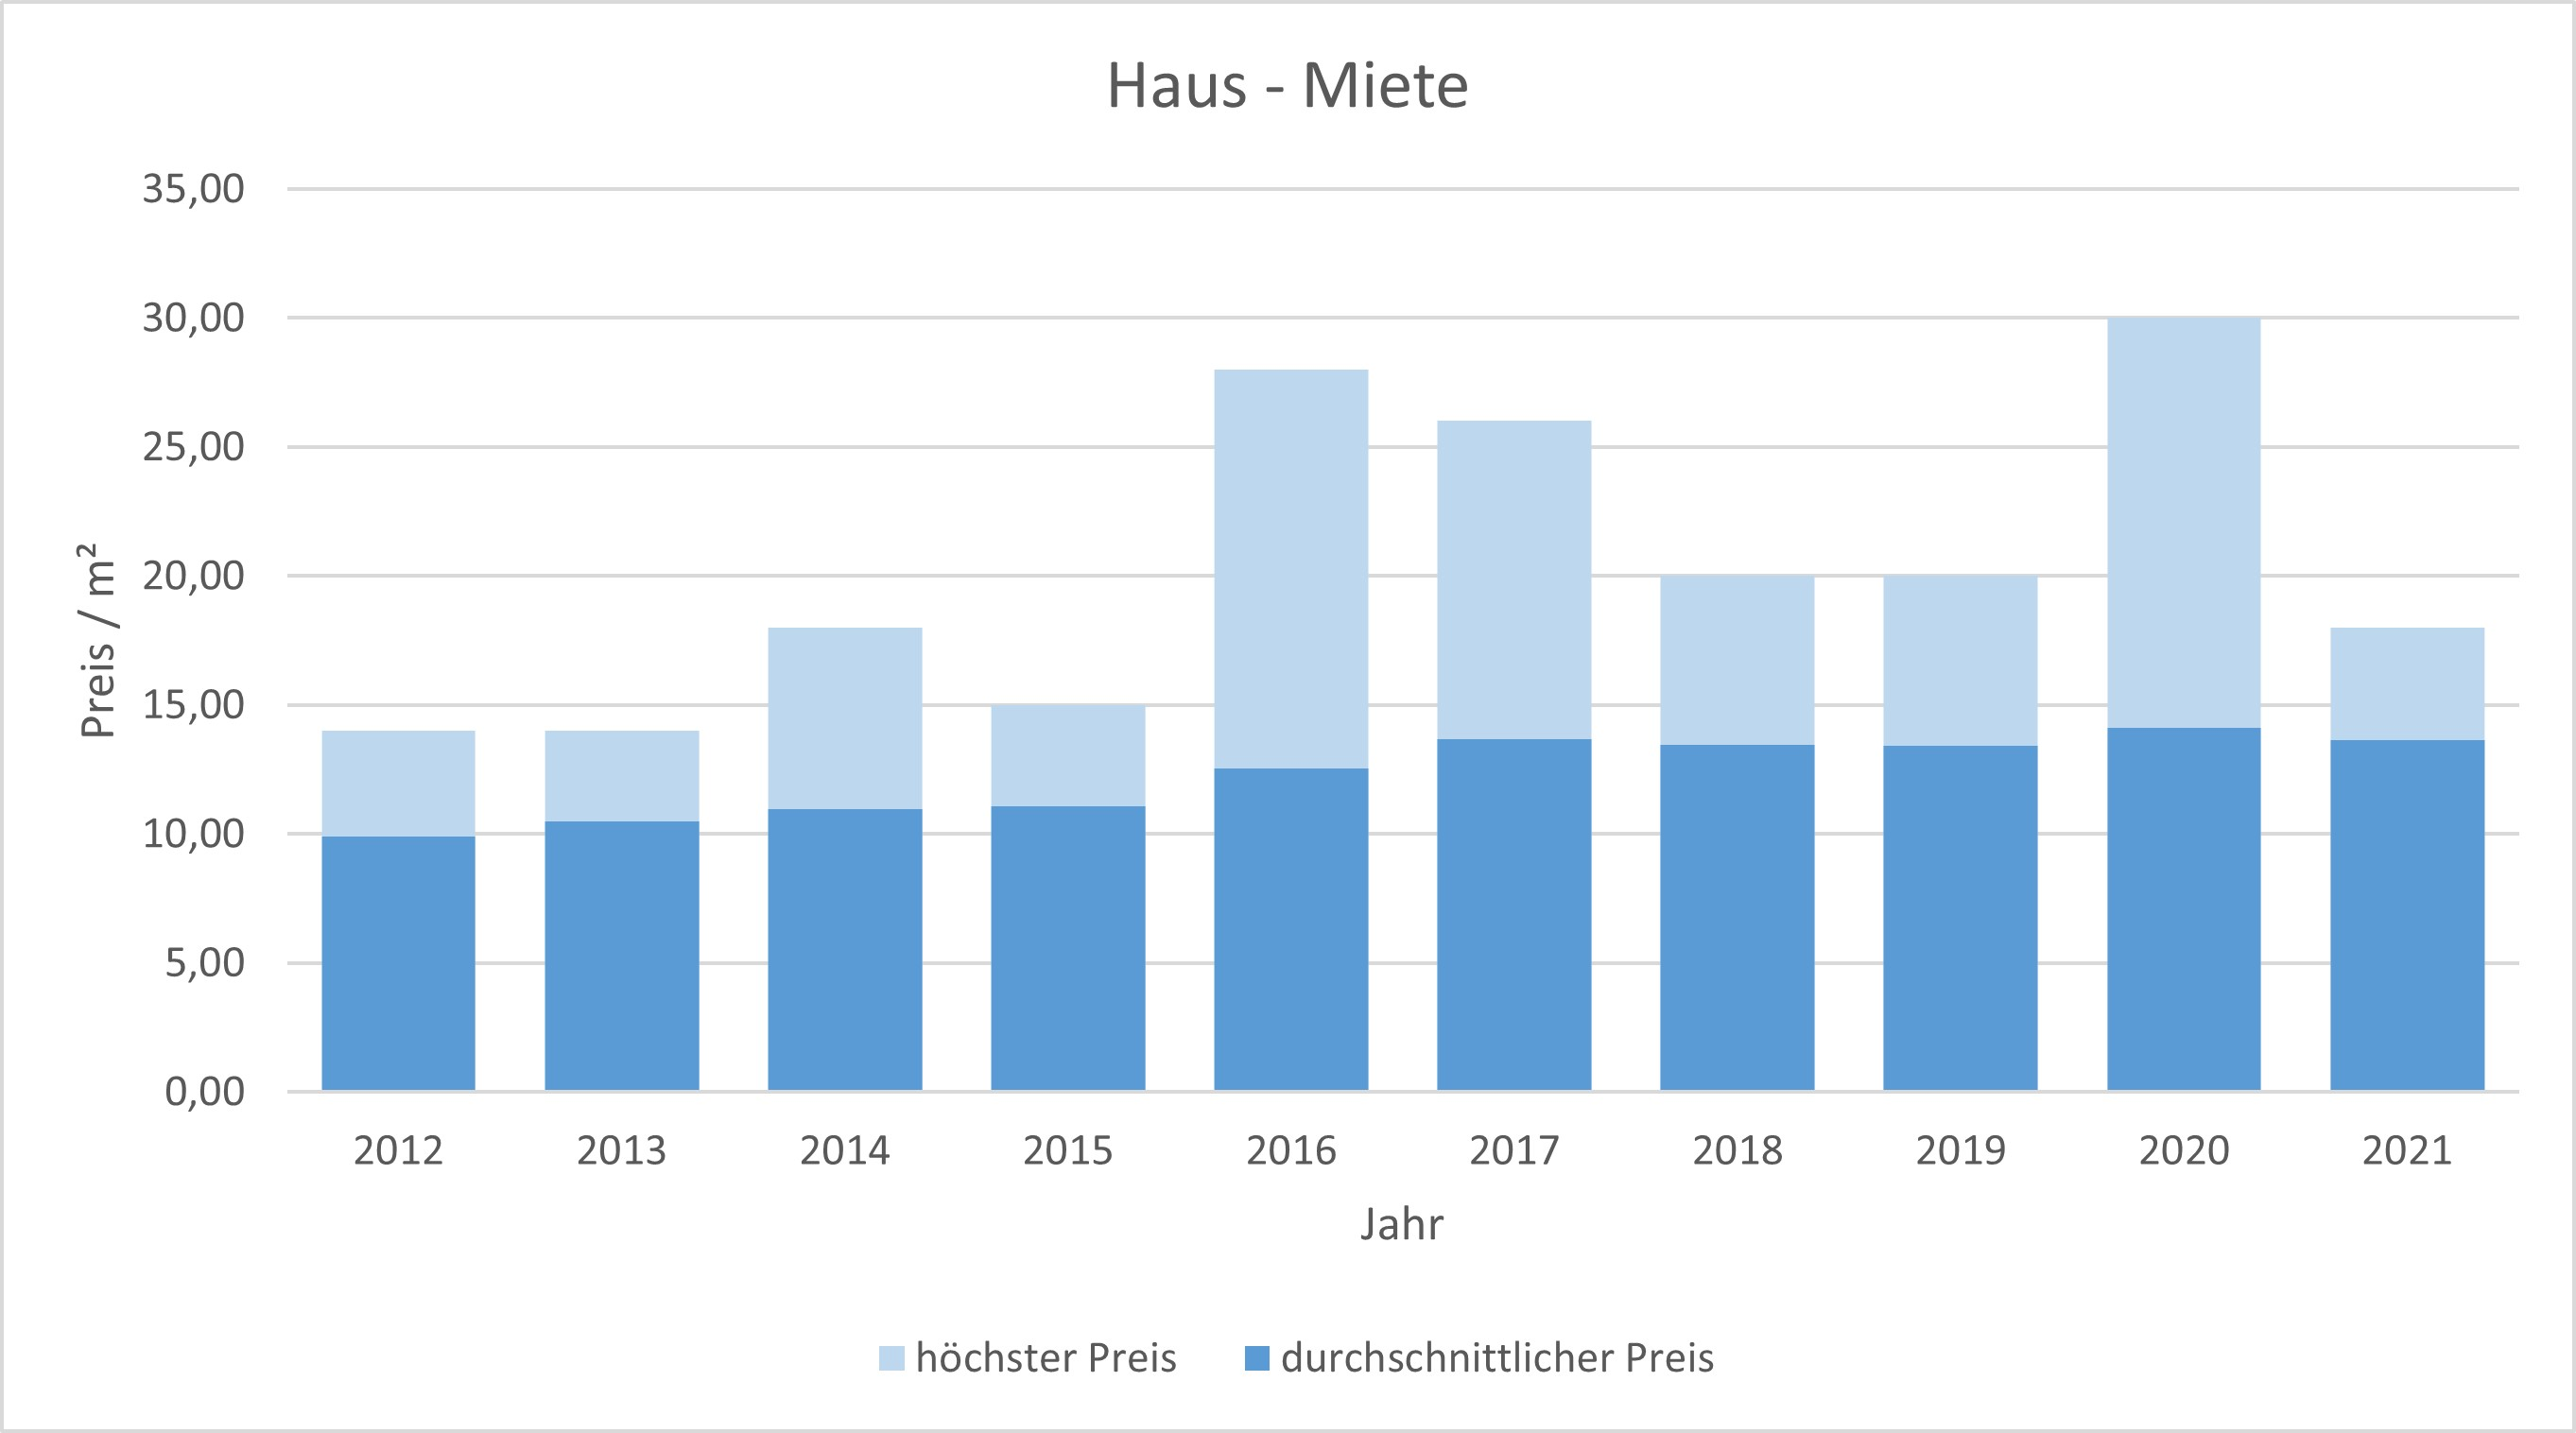 Dachau Haus vermieten mieten preis bewertung makler www.happy-immo.de 2019 2020 2021